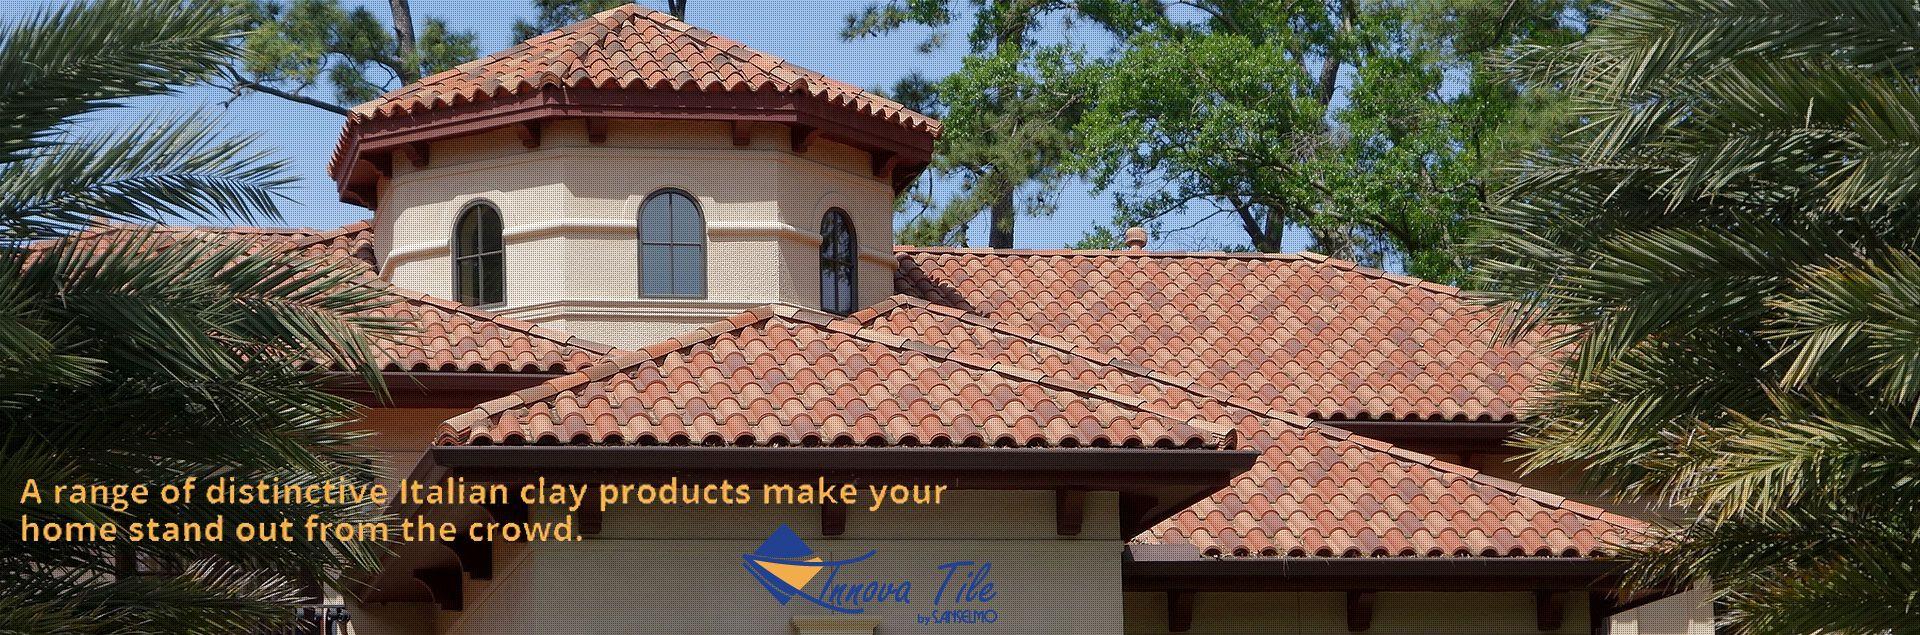 Innova Tile Provides Clay Roof Tiles In Houston Austin Dallas San Antonio College Station Fort Worth El Paso Arlin Clay Roof Tiles Clay Roofs Roof Tiles